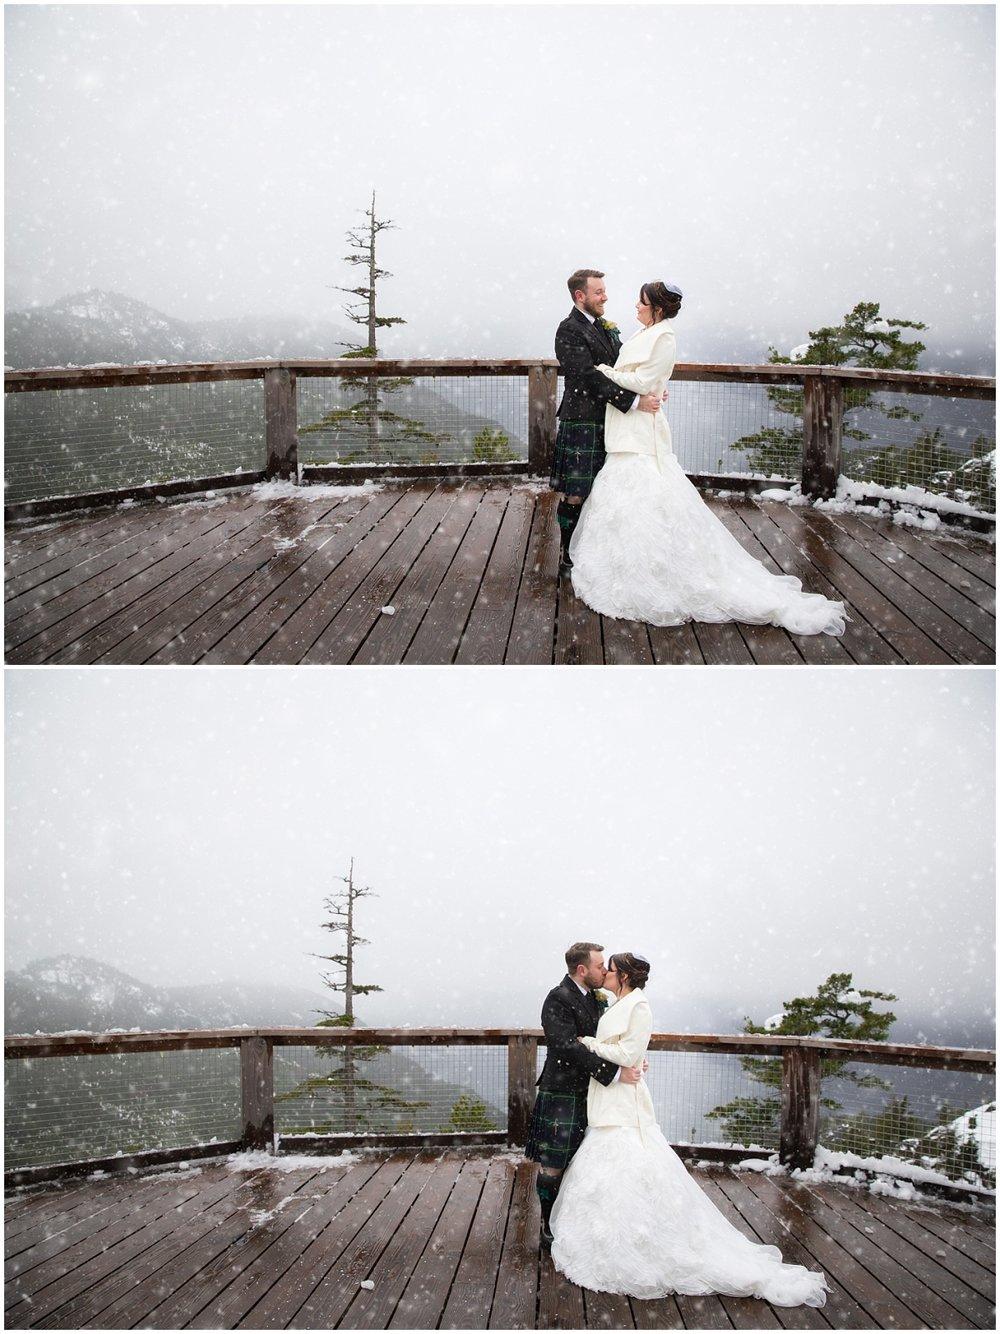 Amazing Day Photography - Squamish Wedding - Howe Sound Inn Wedding - Sea to Sky Gondola Wedding - Squamish Wedding Photographer - Winter Wedding - Snowy Wedding (8).jpg